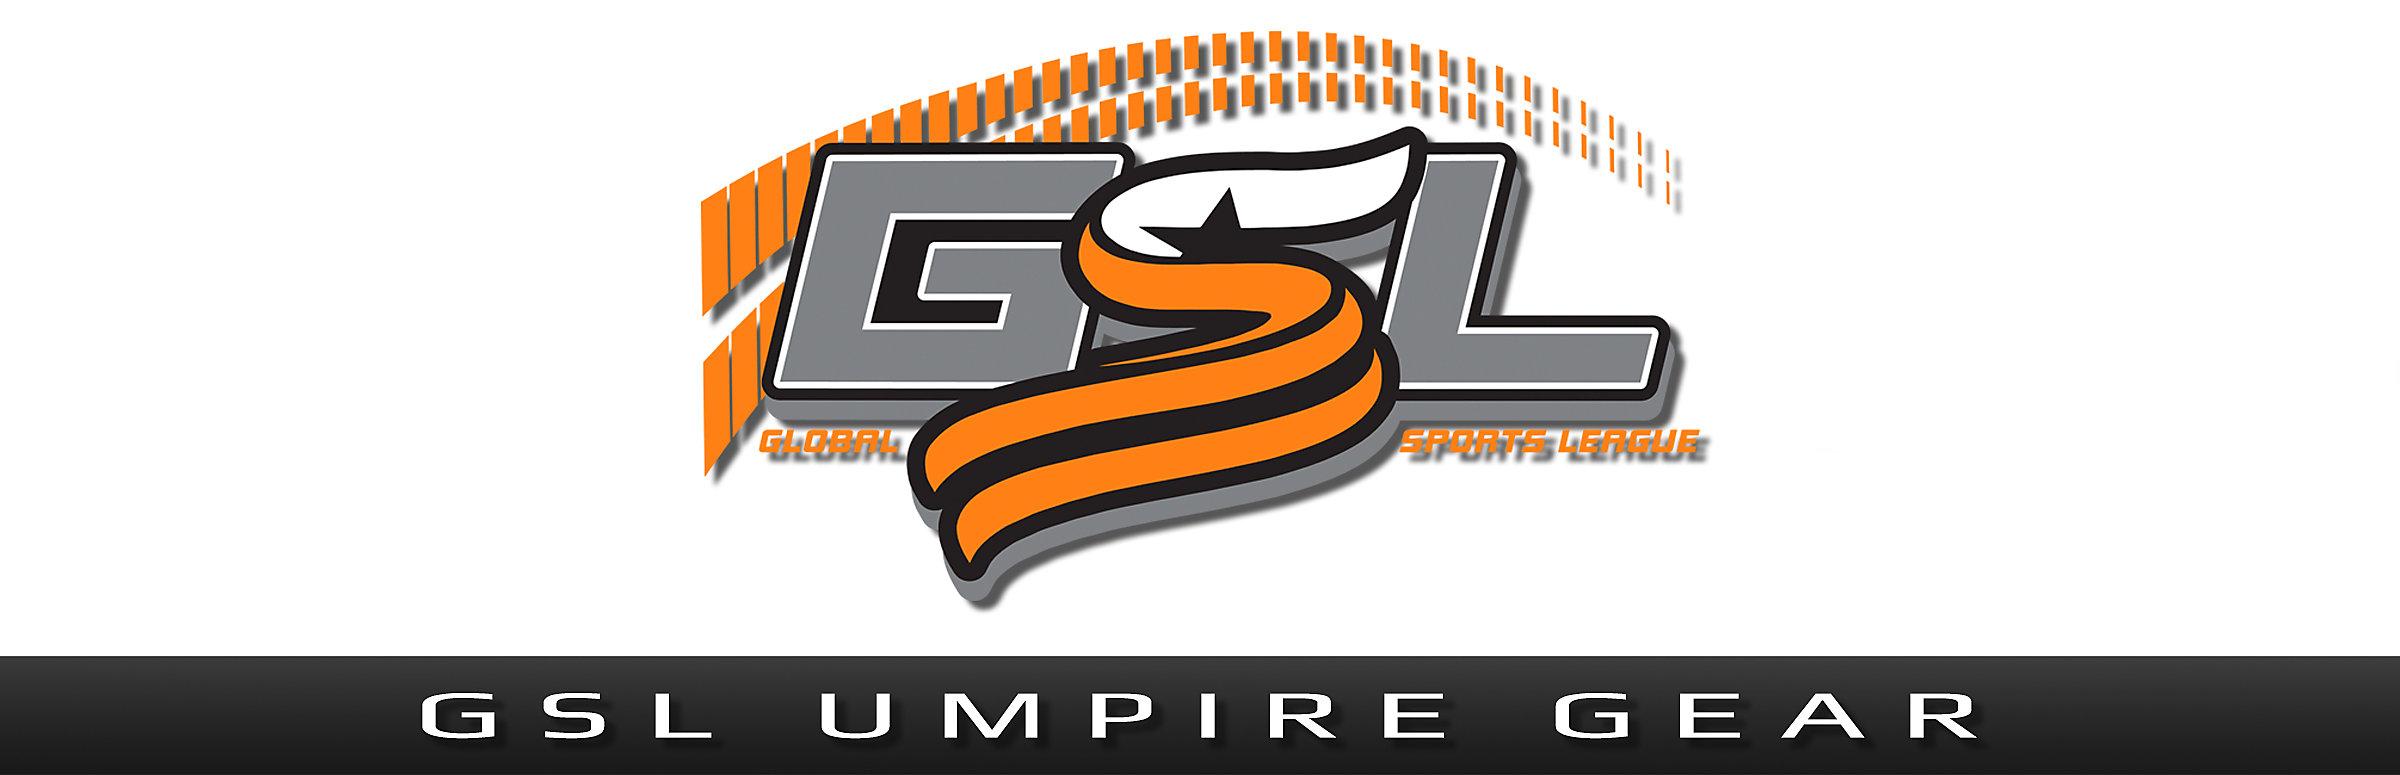 GSL Umpire Gear